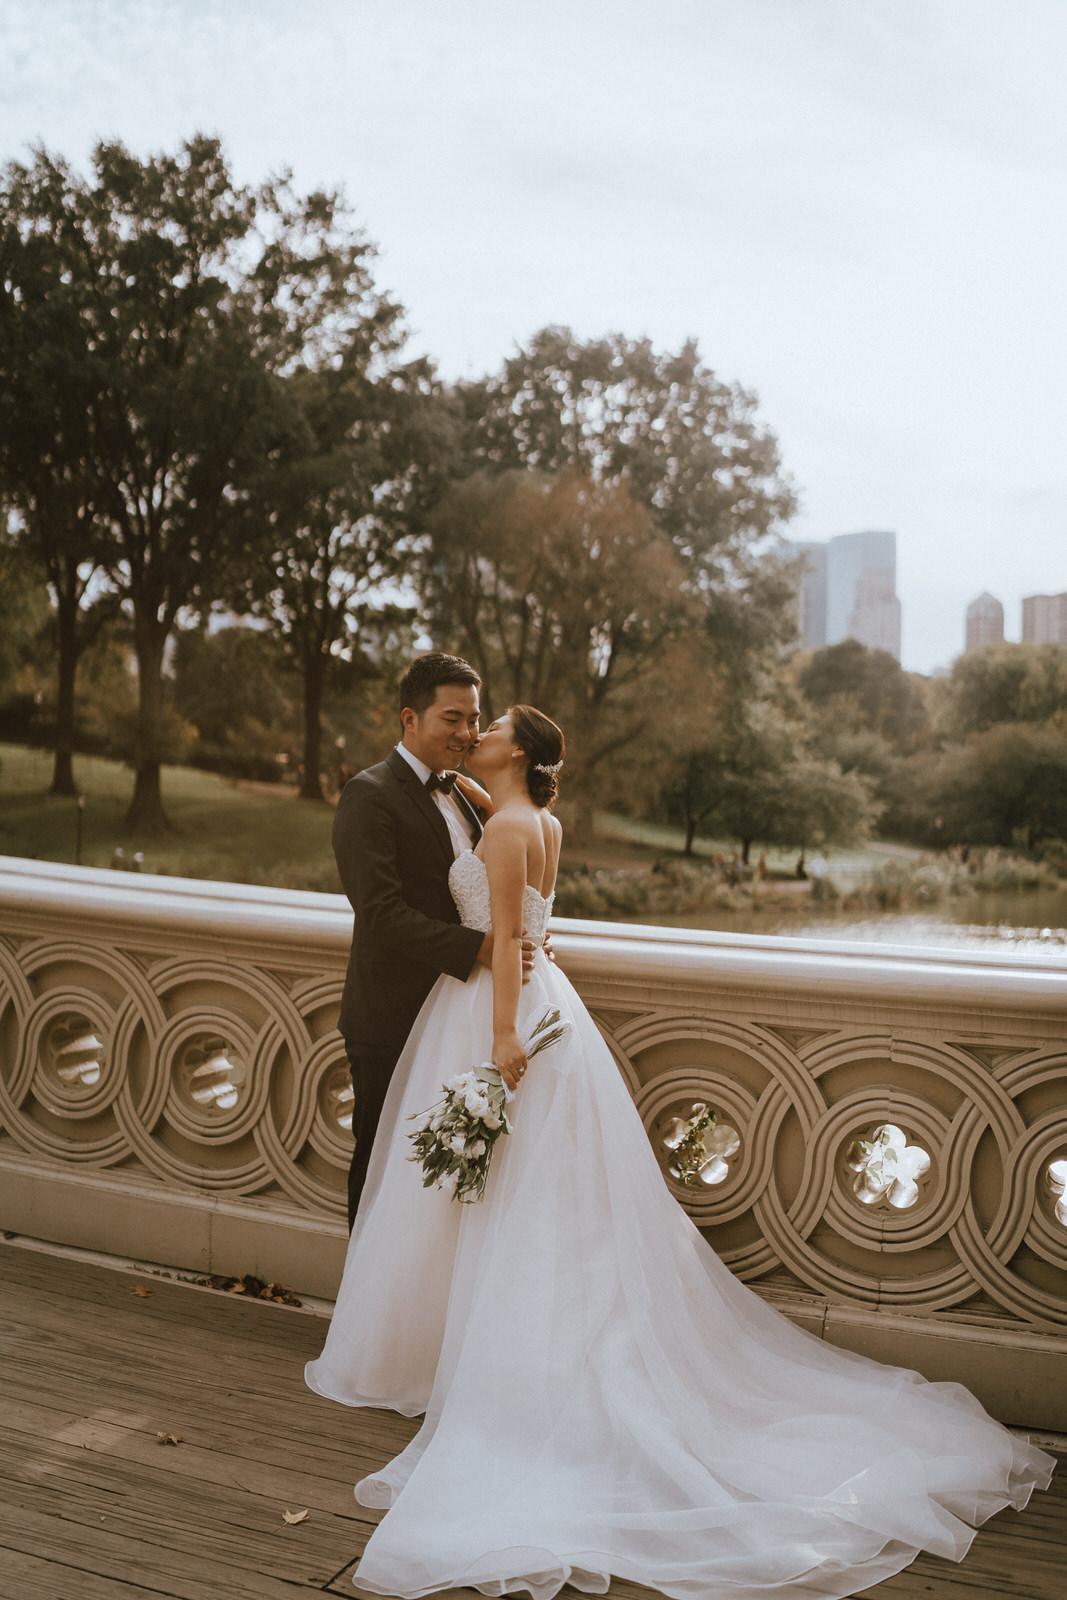 Central Park Elopement Photos-Bow Bridge-Michelle Gonzalez Photography- New York Wedding Photographer-19.jpg